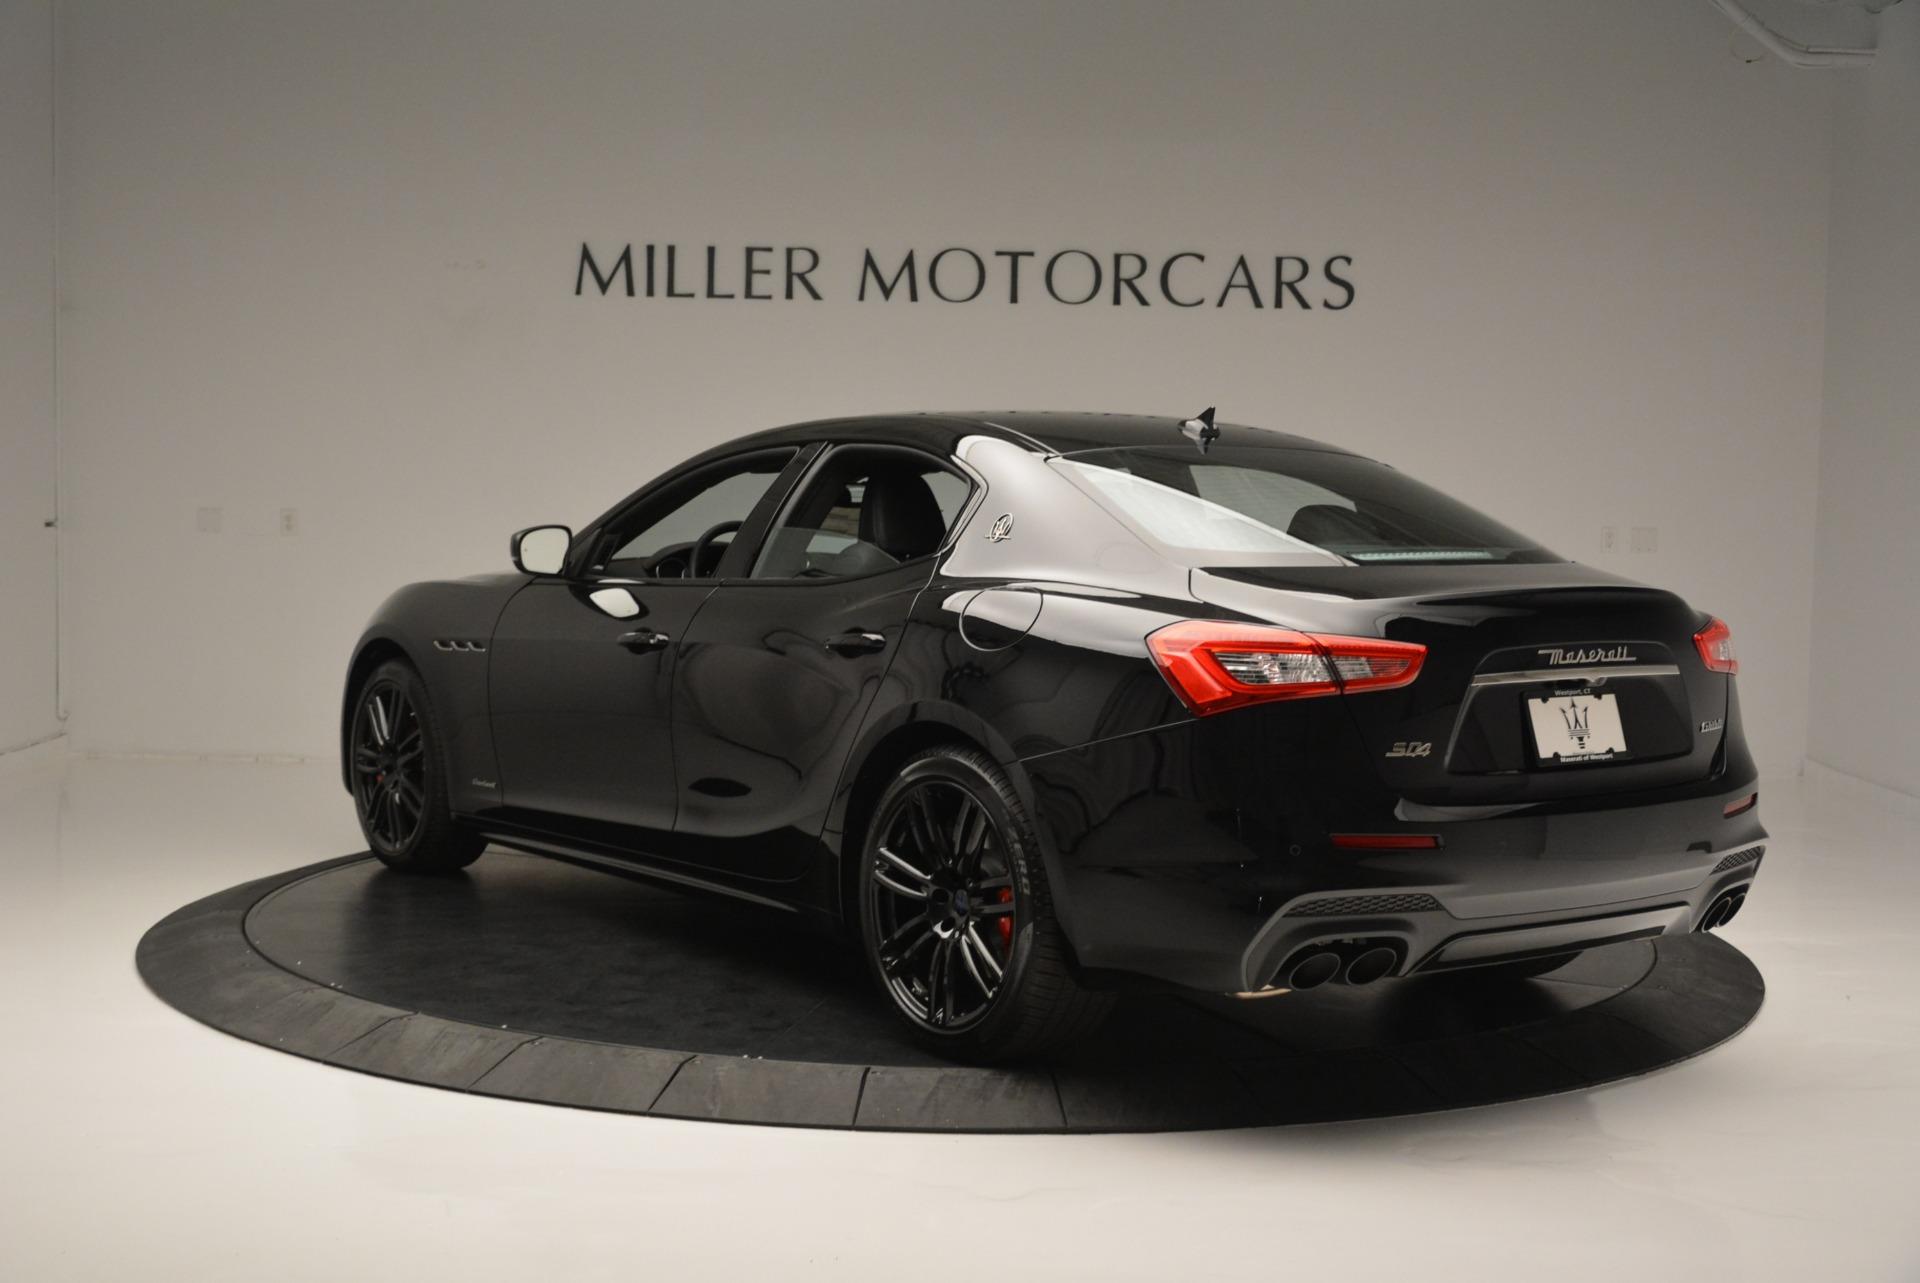 New 2018 Maserati Ghibli SQ4 GranSport Nerissimo For Sale In Westport, CT 2372_p5